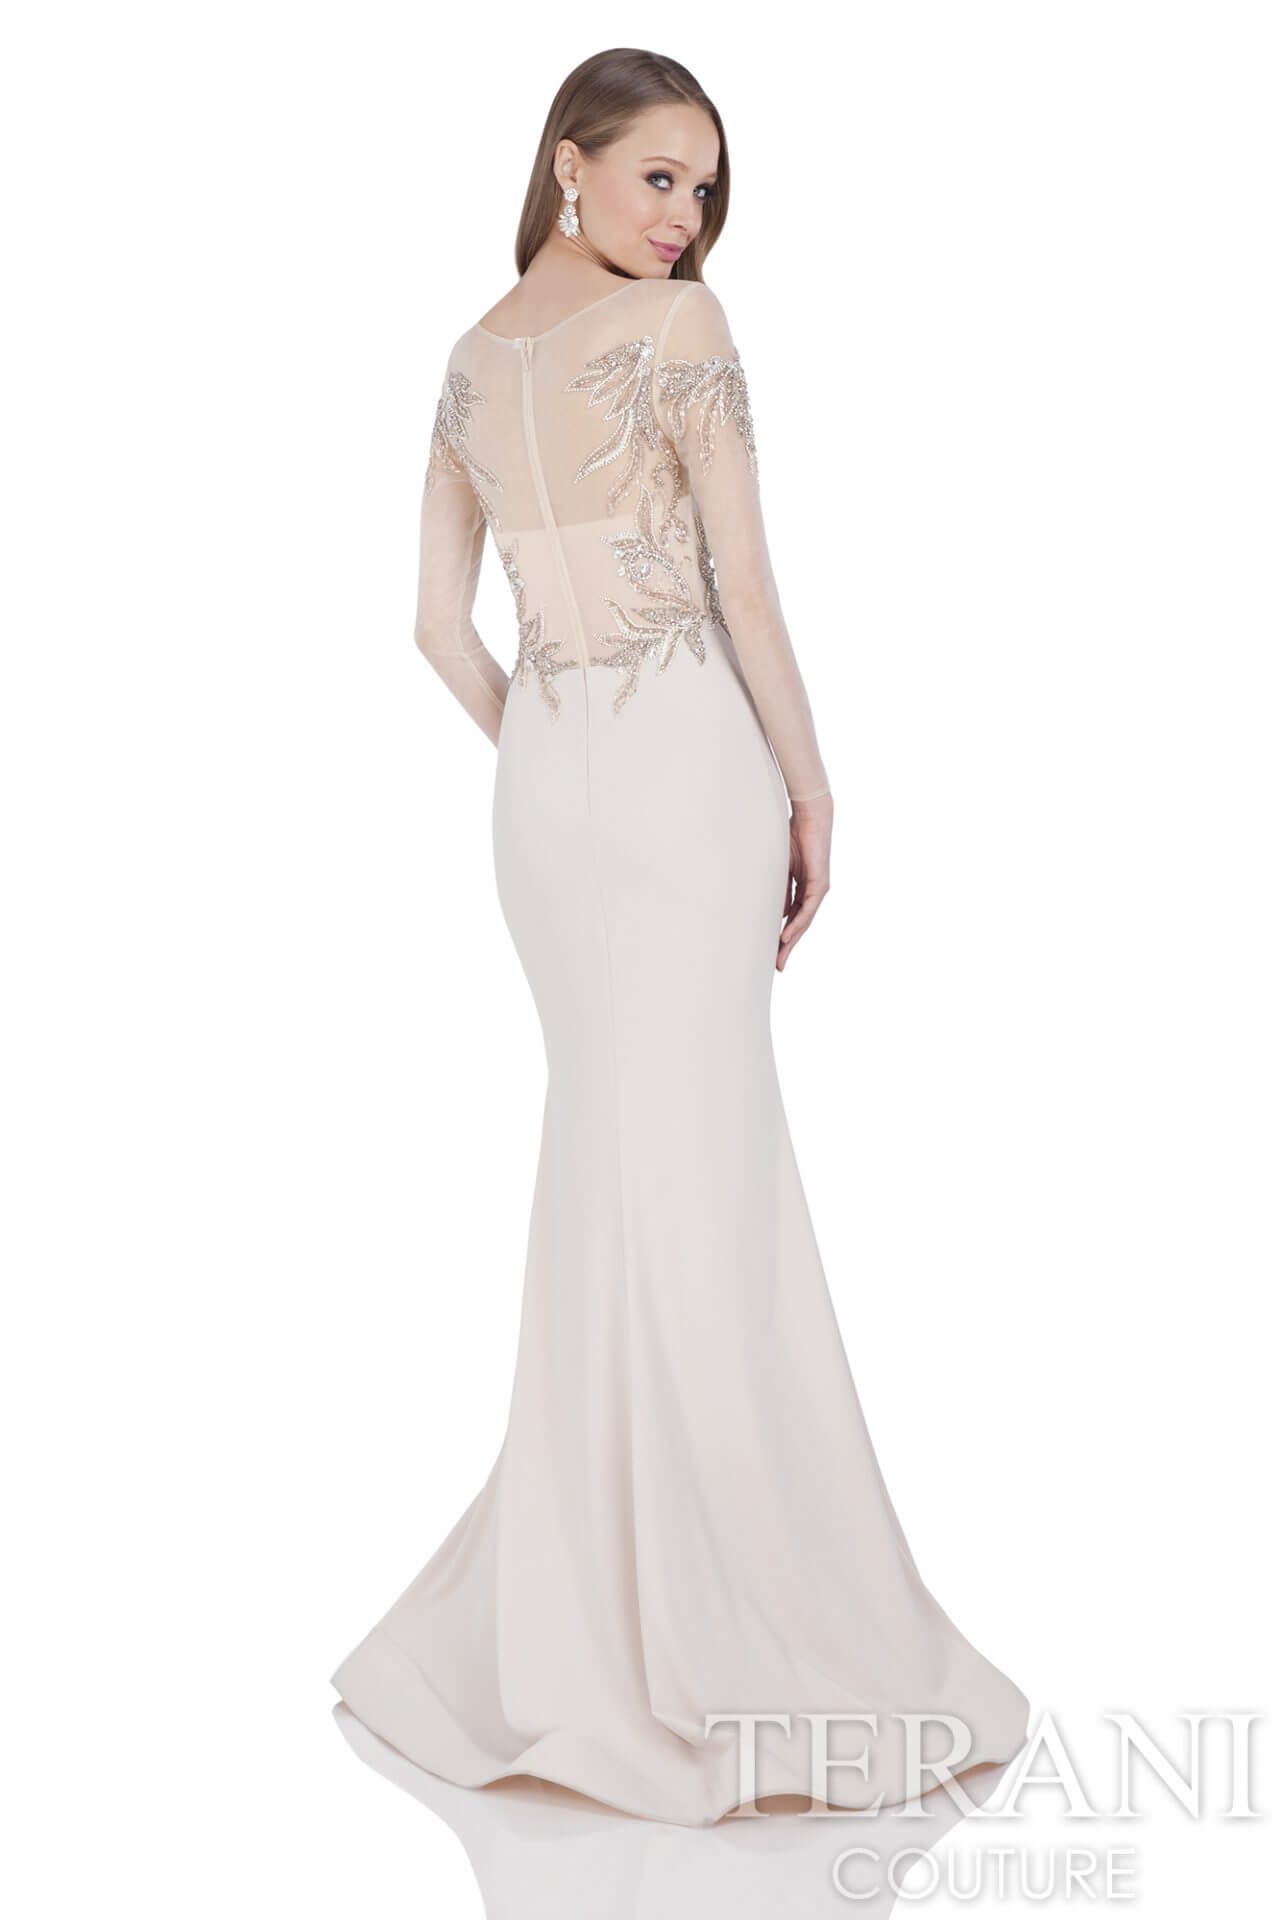 Black wedding dresses near me la femme fantastic dresses for Wedding dresses near me cheap